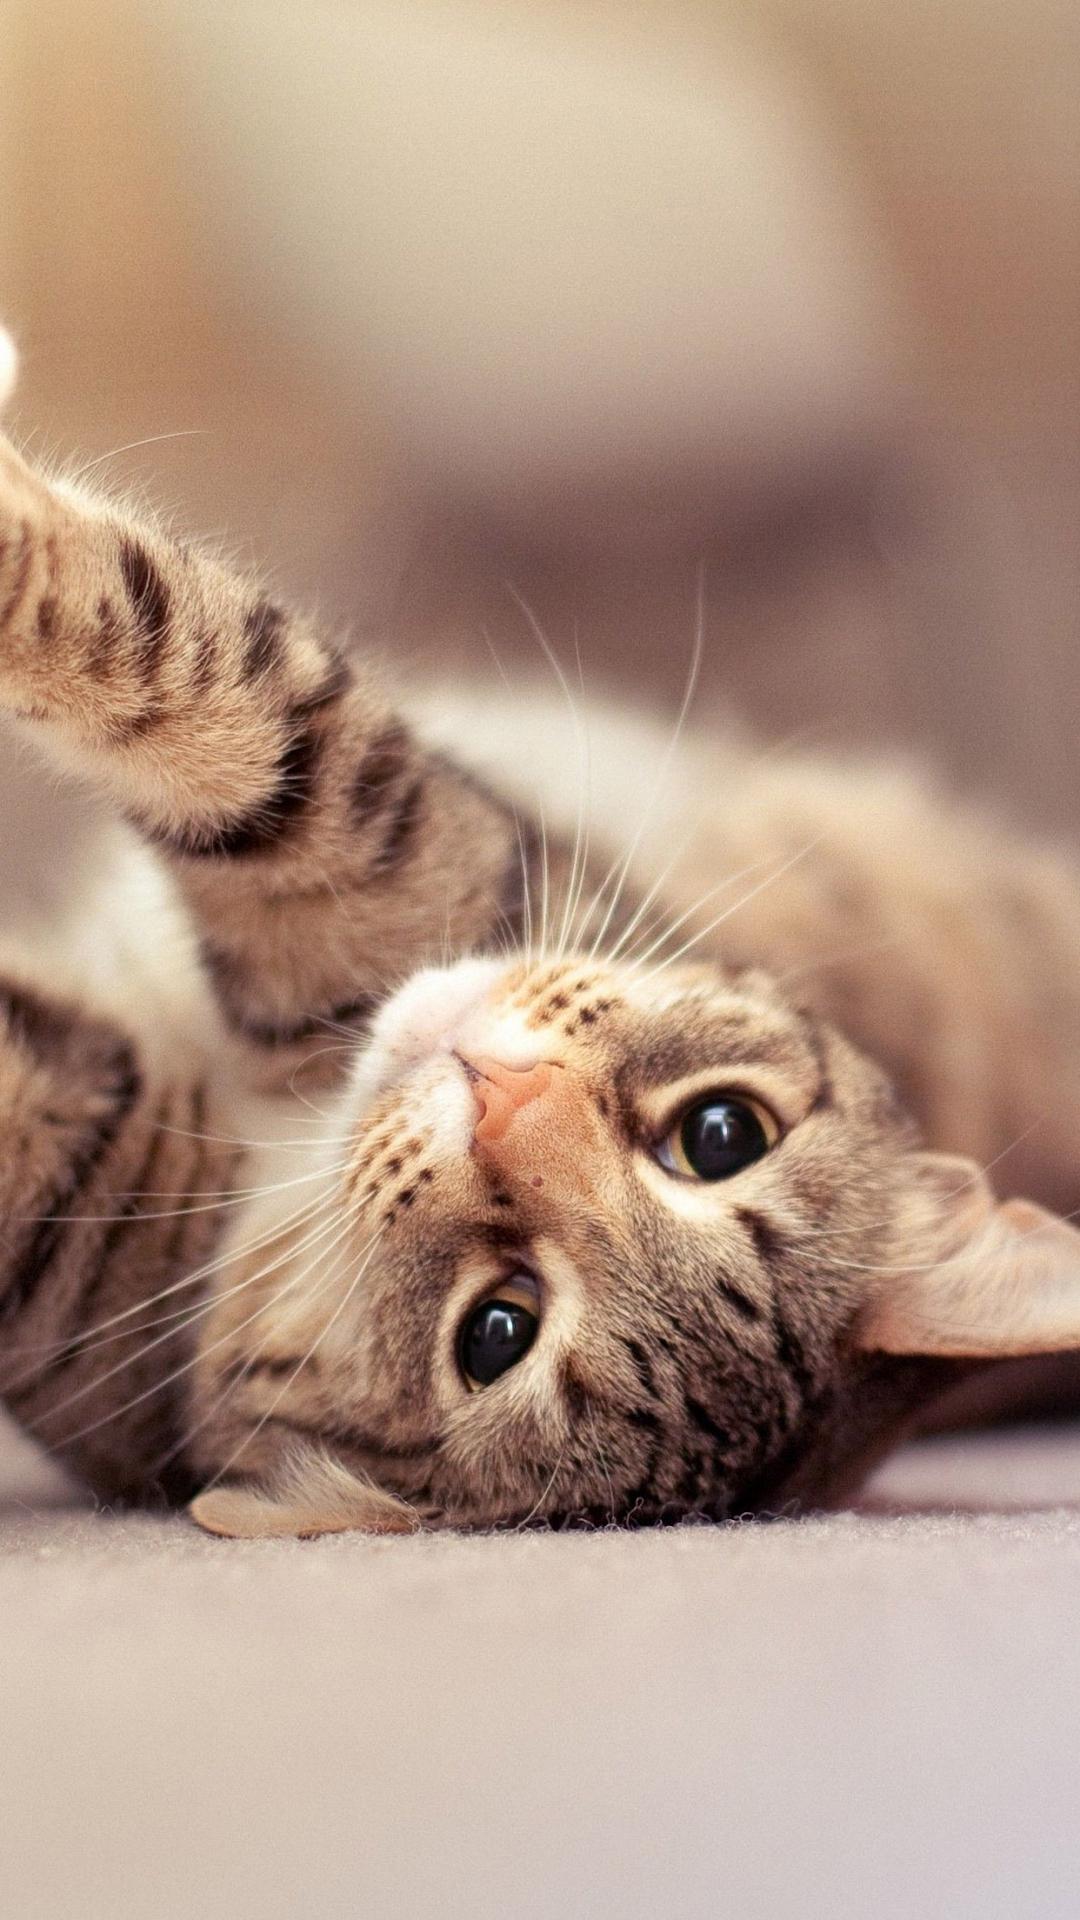 Cat Hd Iphone Wallpapers Wallpaper Cave